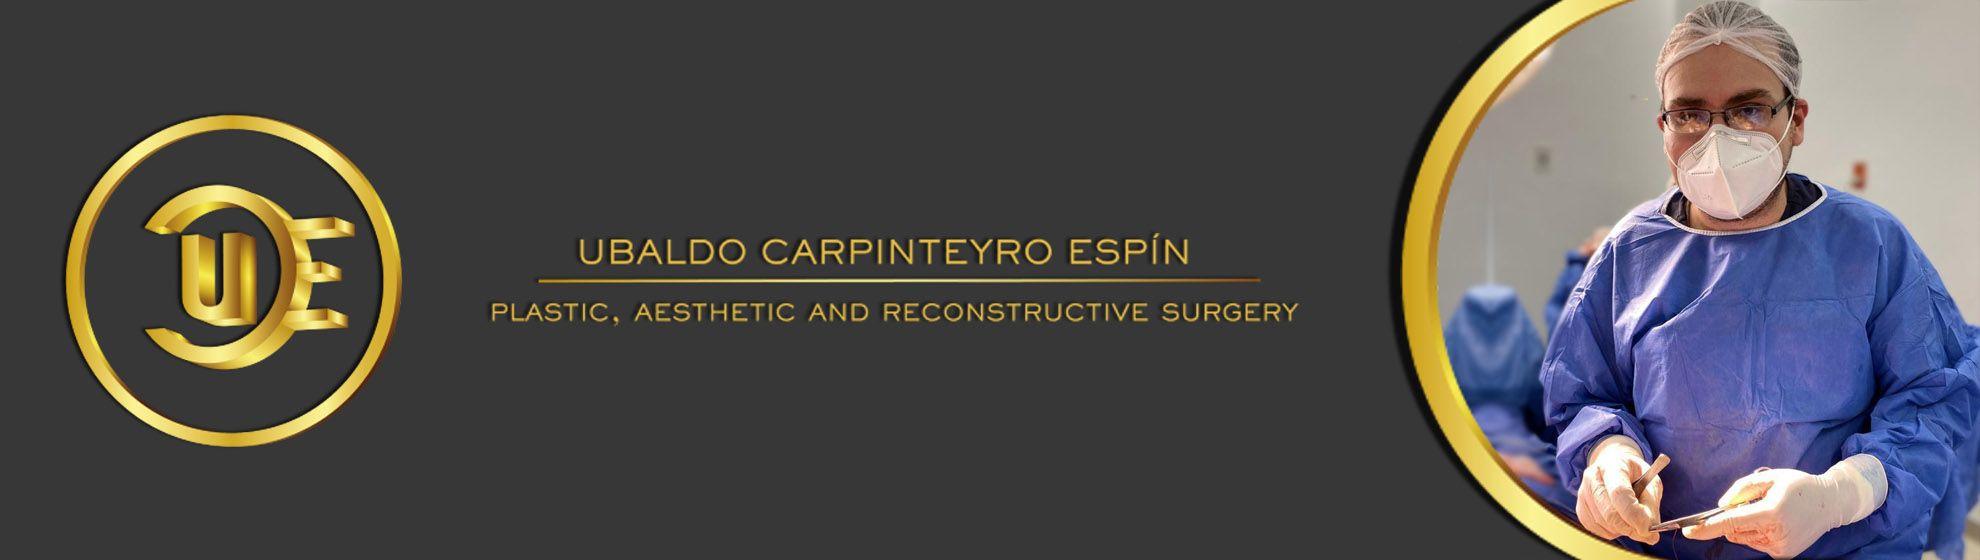 Dr. Ubaldo Carpinteyro Espín